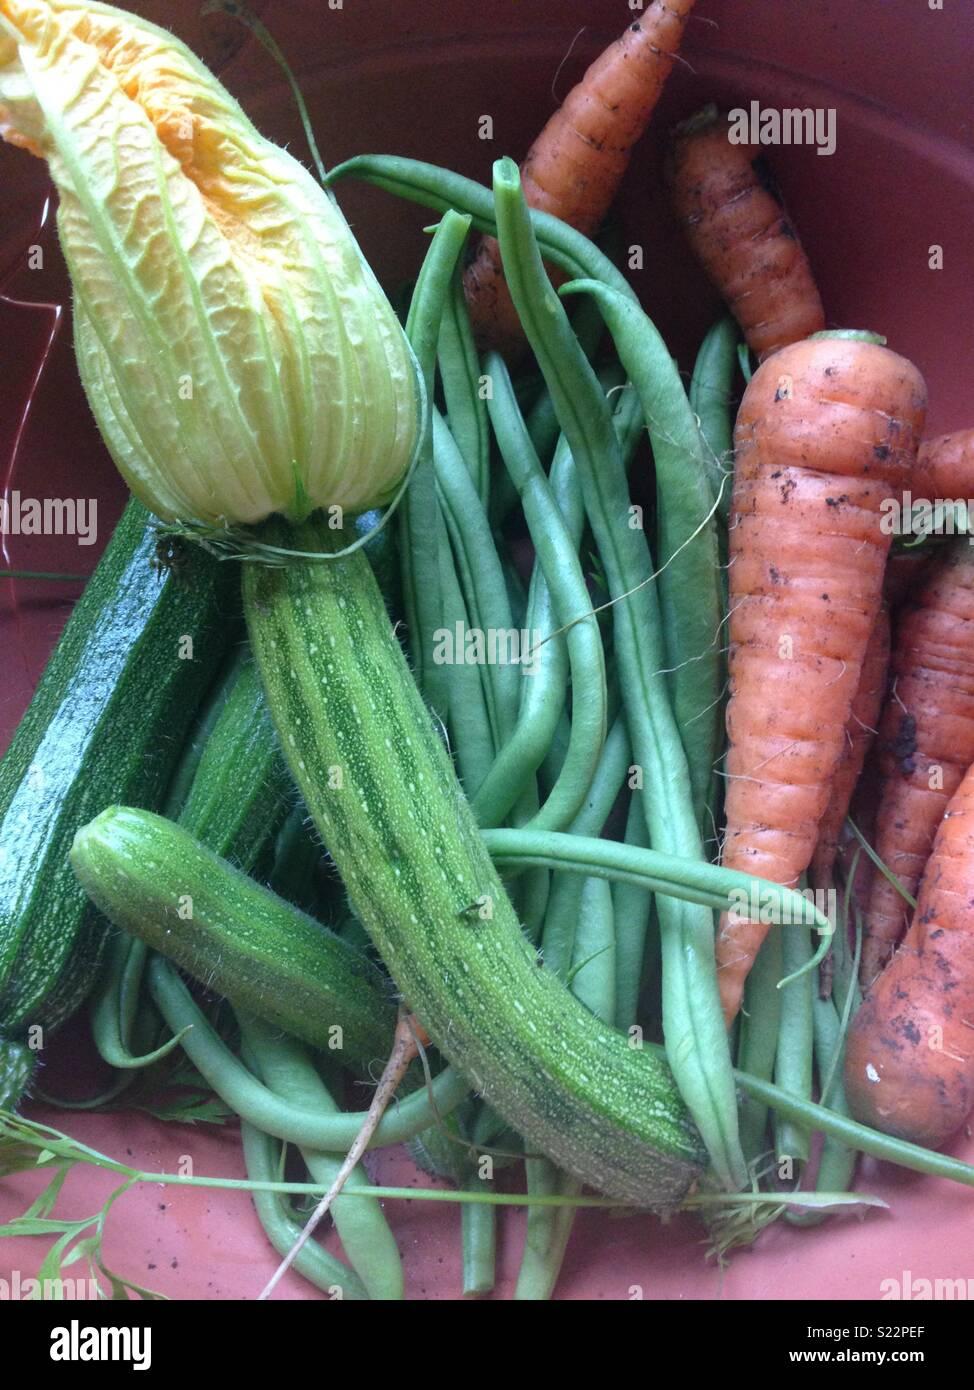 Homegrown vegetables - Stock Image